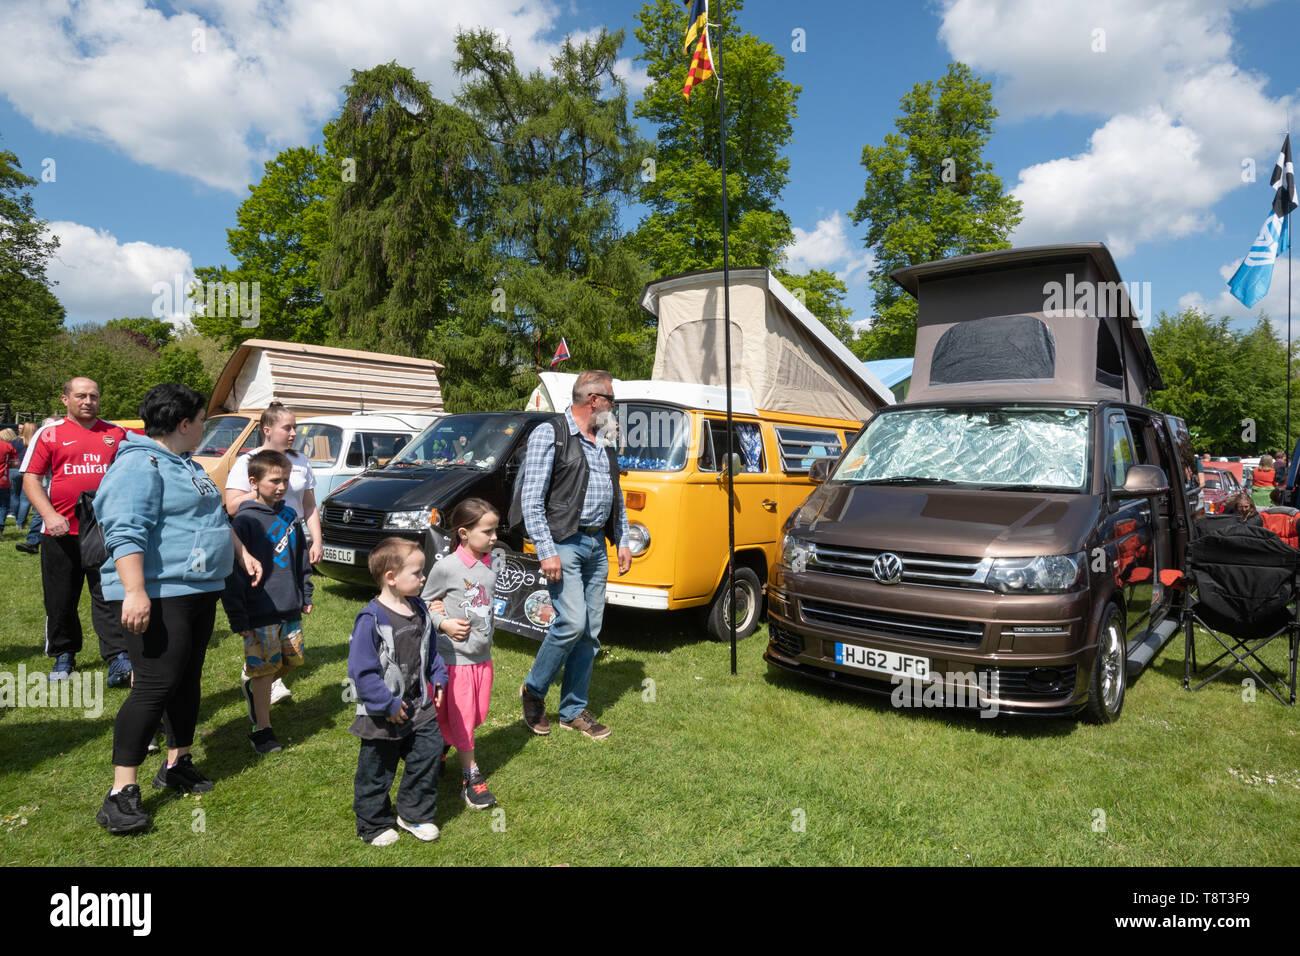 Campervans Stock Photos & Campervans Stock Images - Alamy